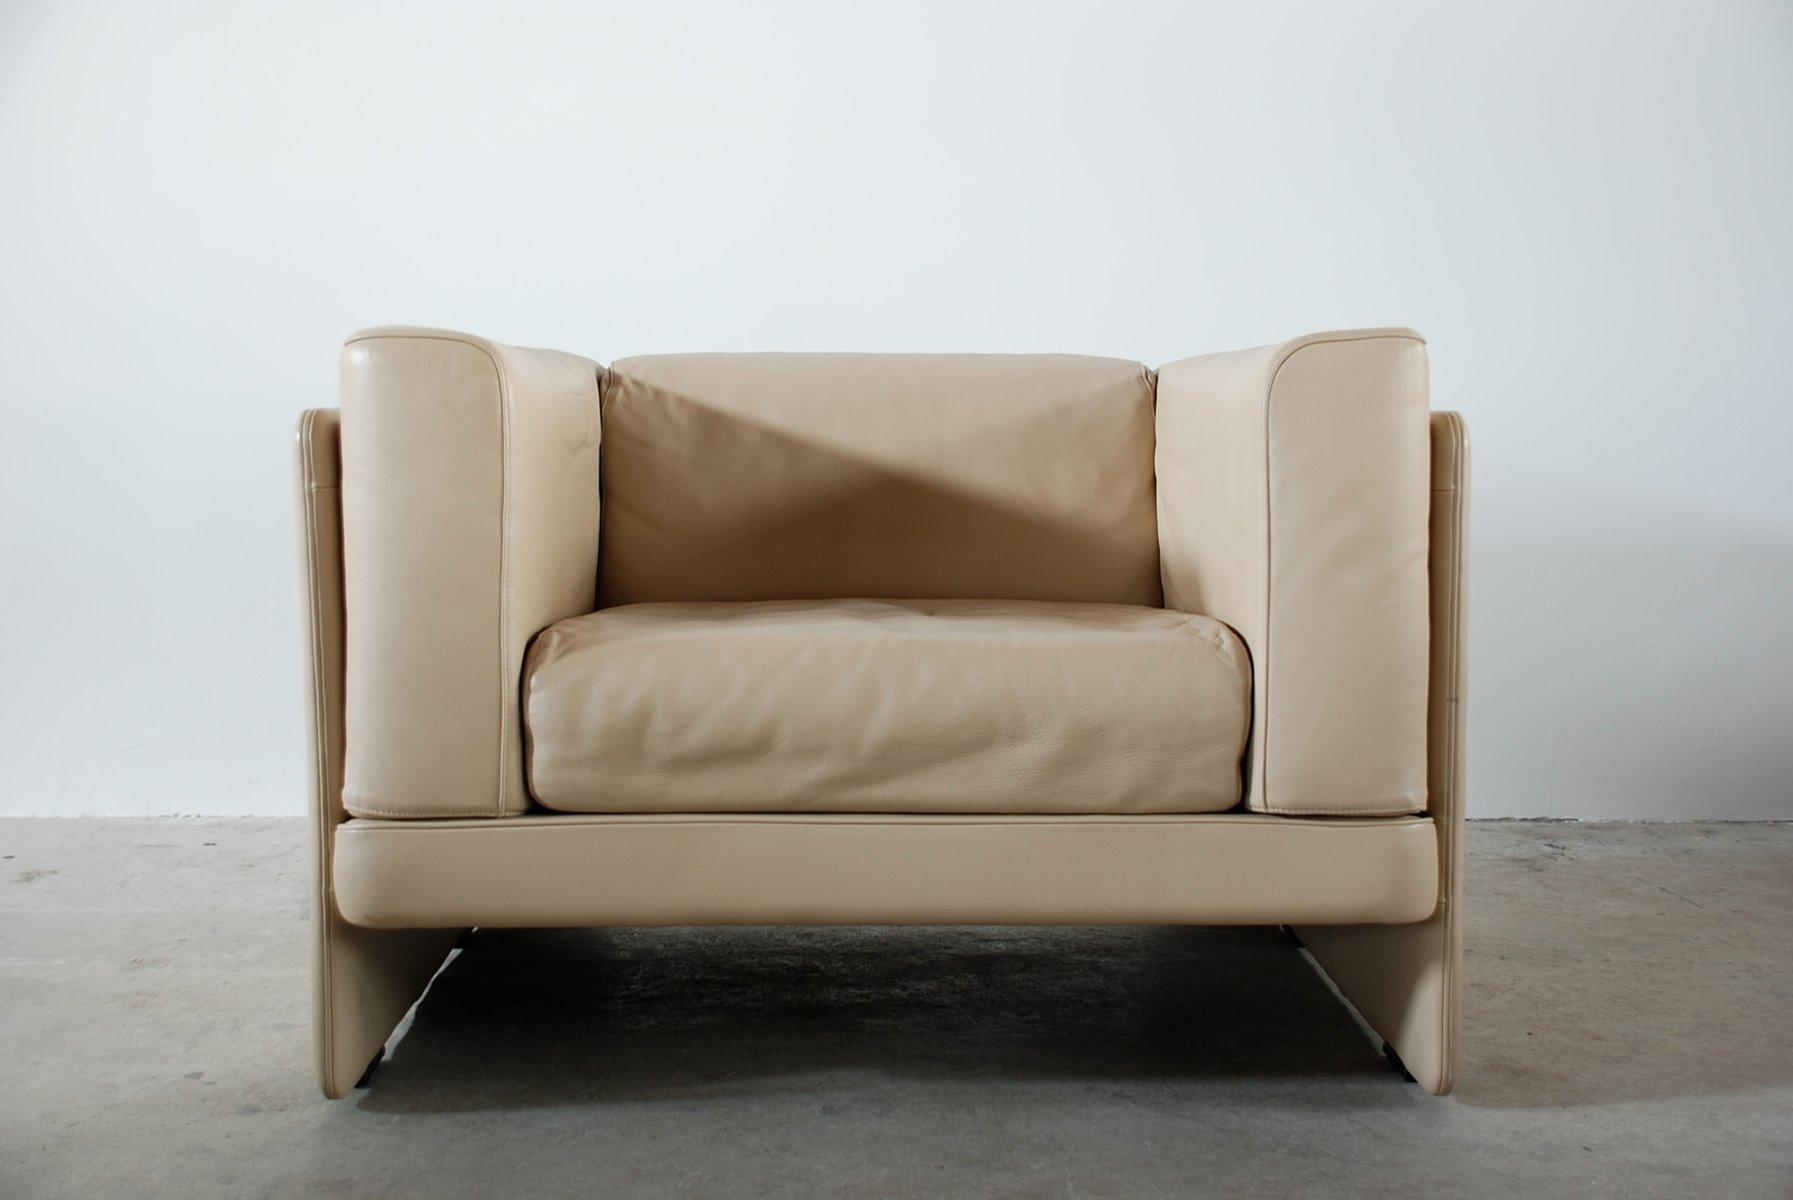 vintage le capannelle sessel von tito agnoli f r poltrona frau 2er set bei pamono kaufen. Black Bedroom Furniture Sets. Home Design Ideas